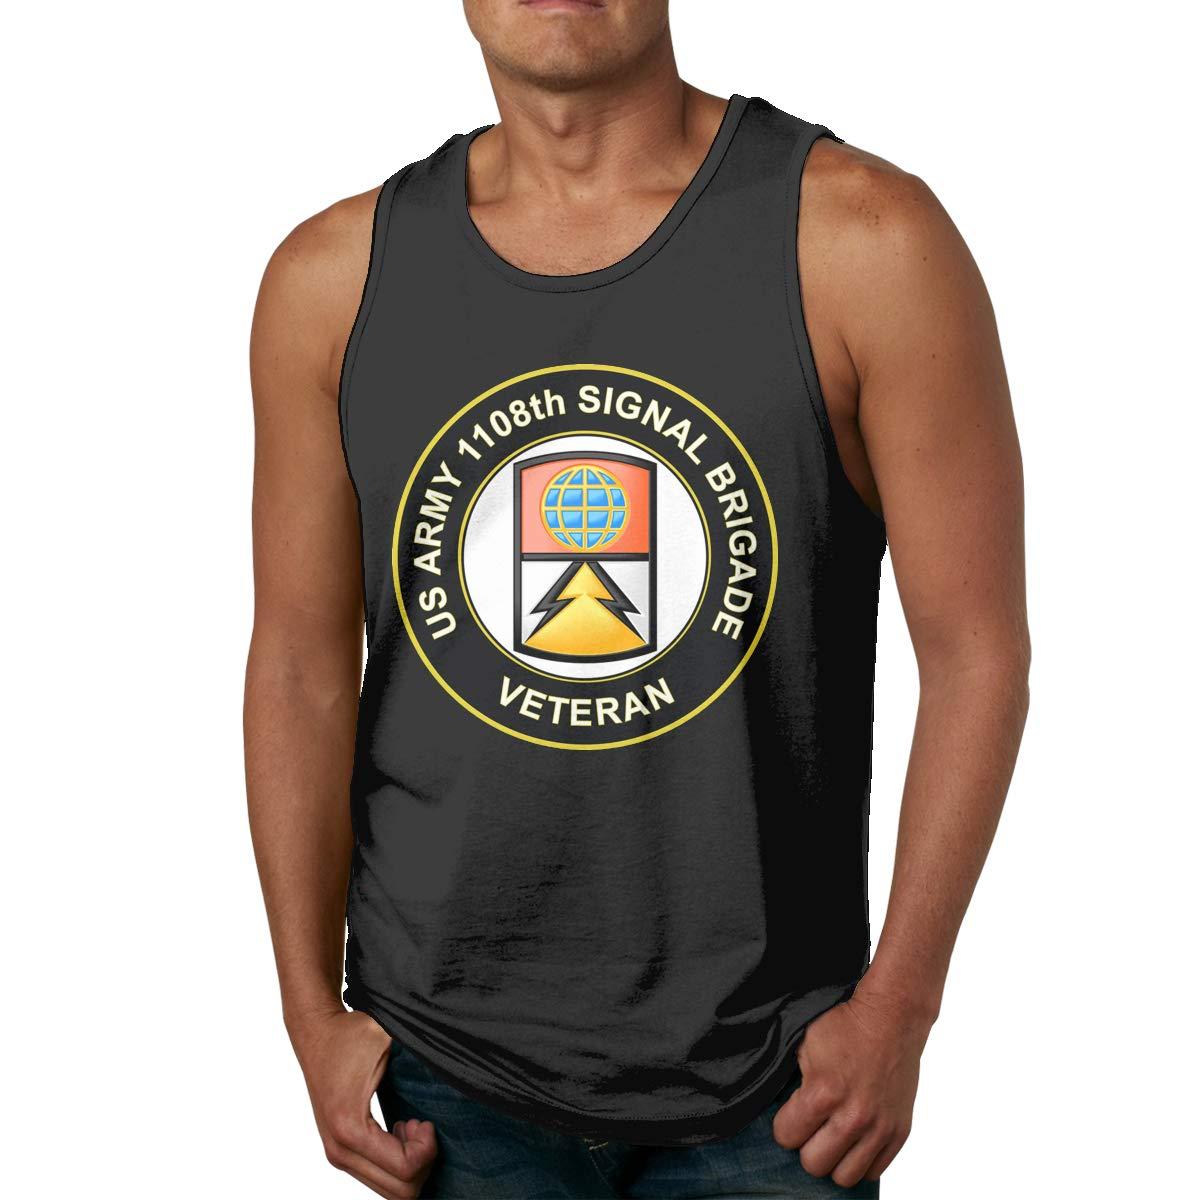 Army 1108th Signal Brigade Veteran Mens Cotton Undershirts Crew Neck Tank Tops U.S